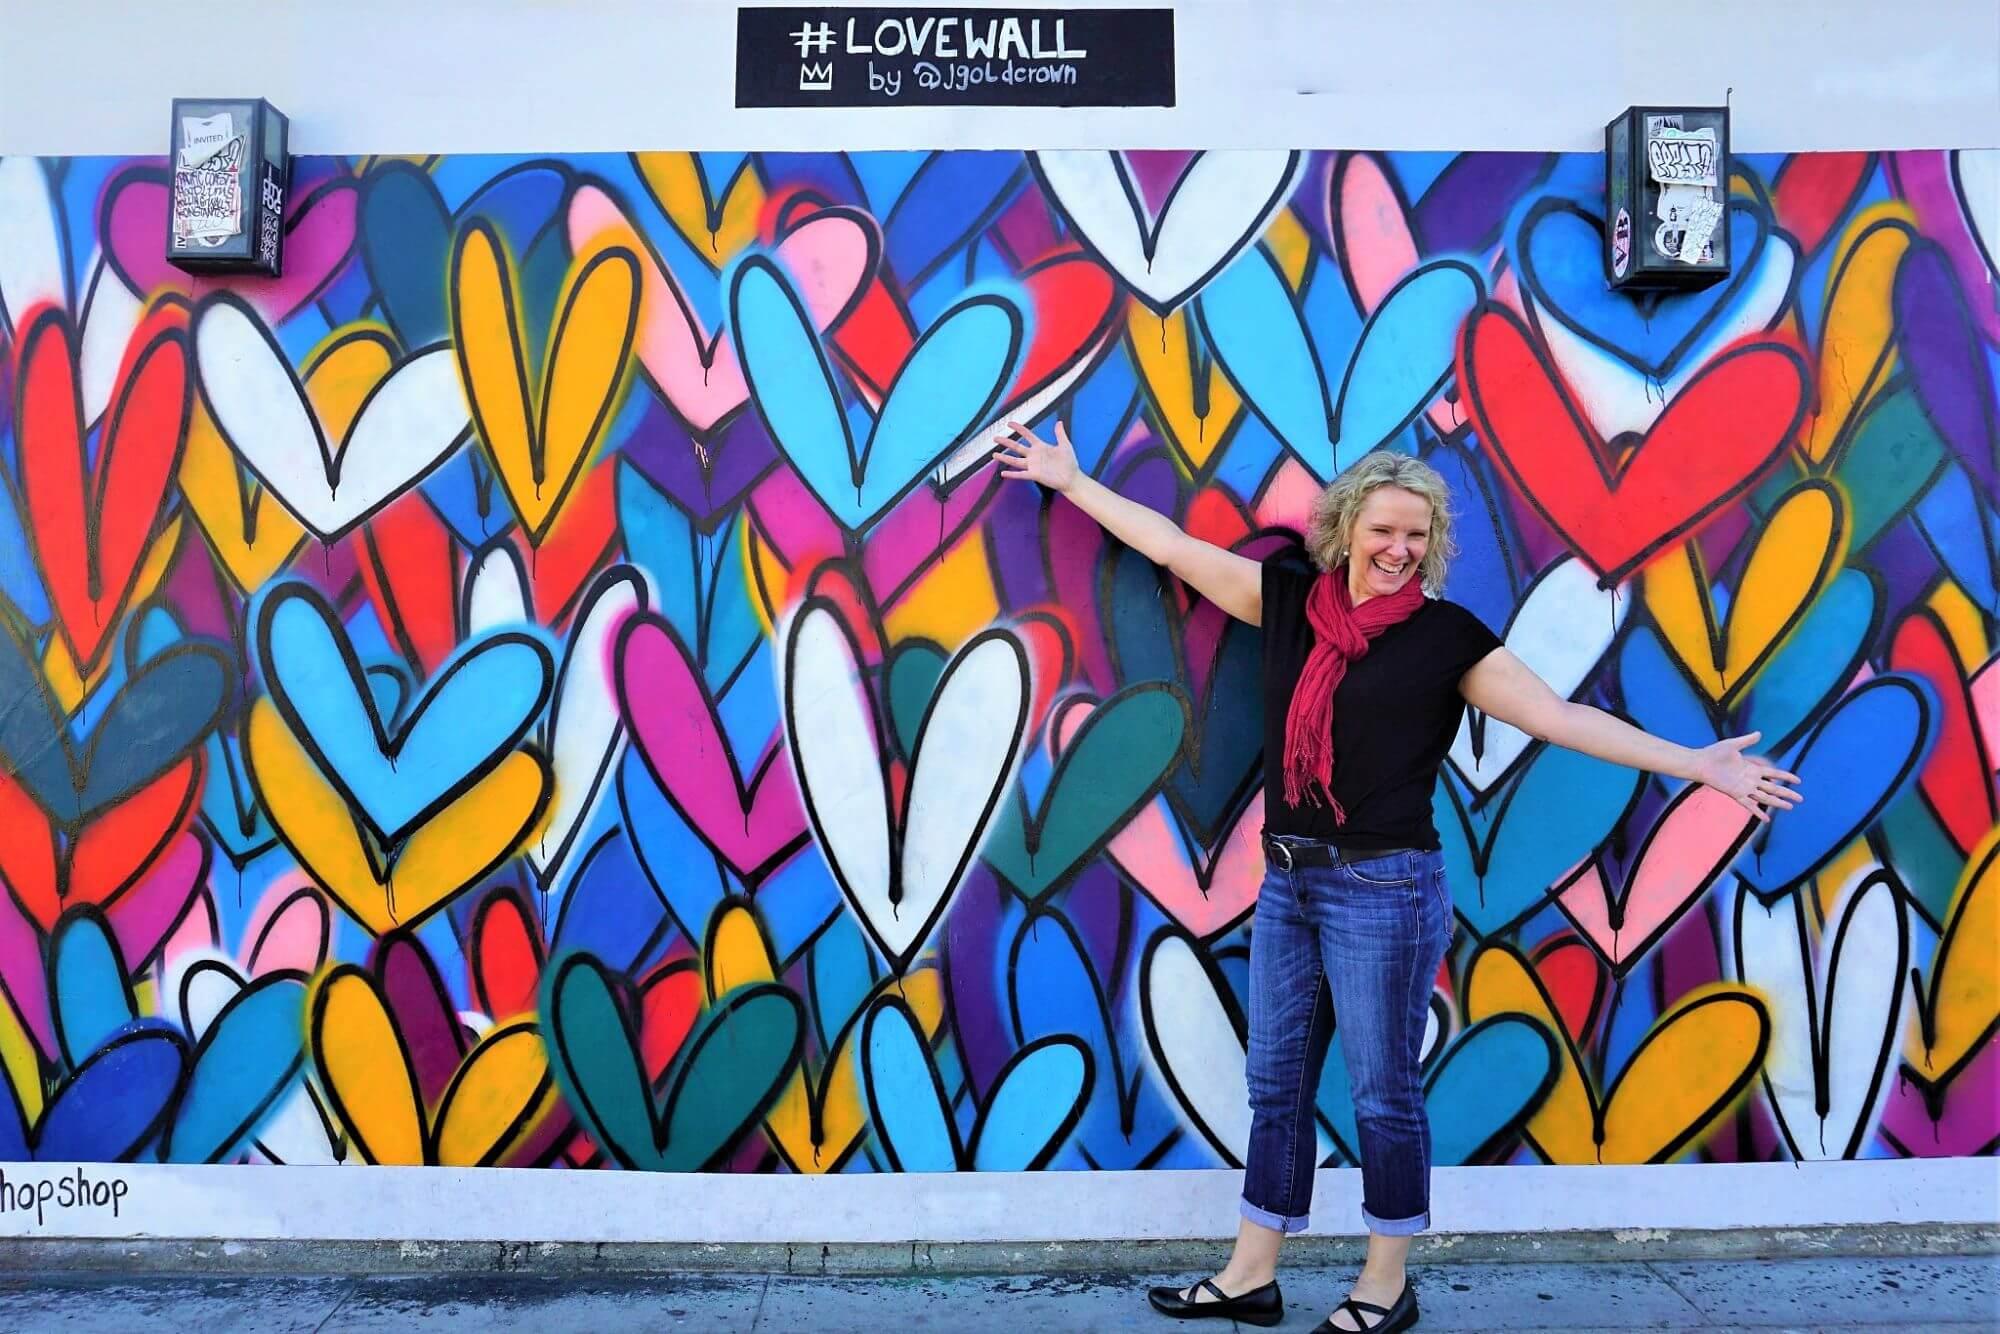 Venice Love Wall